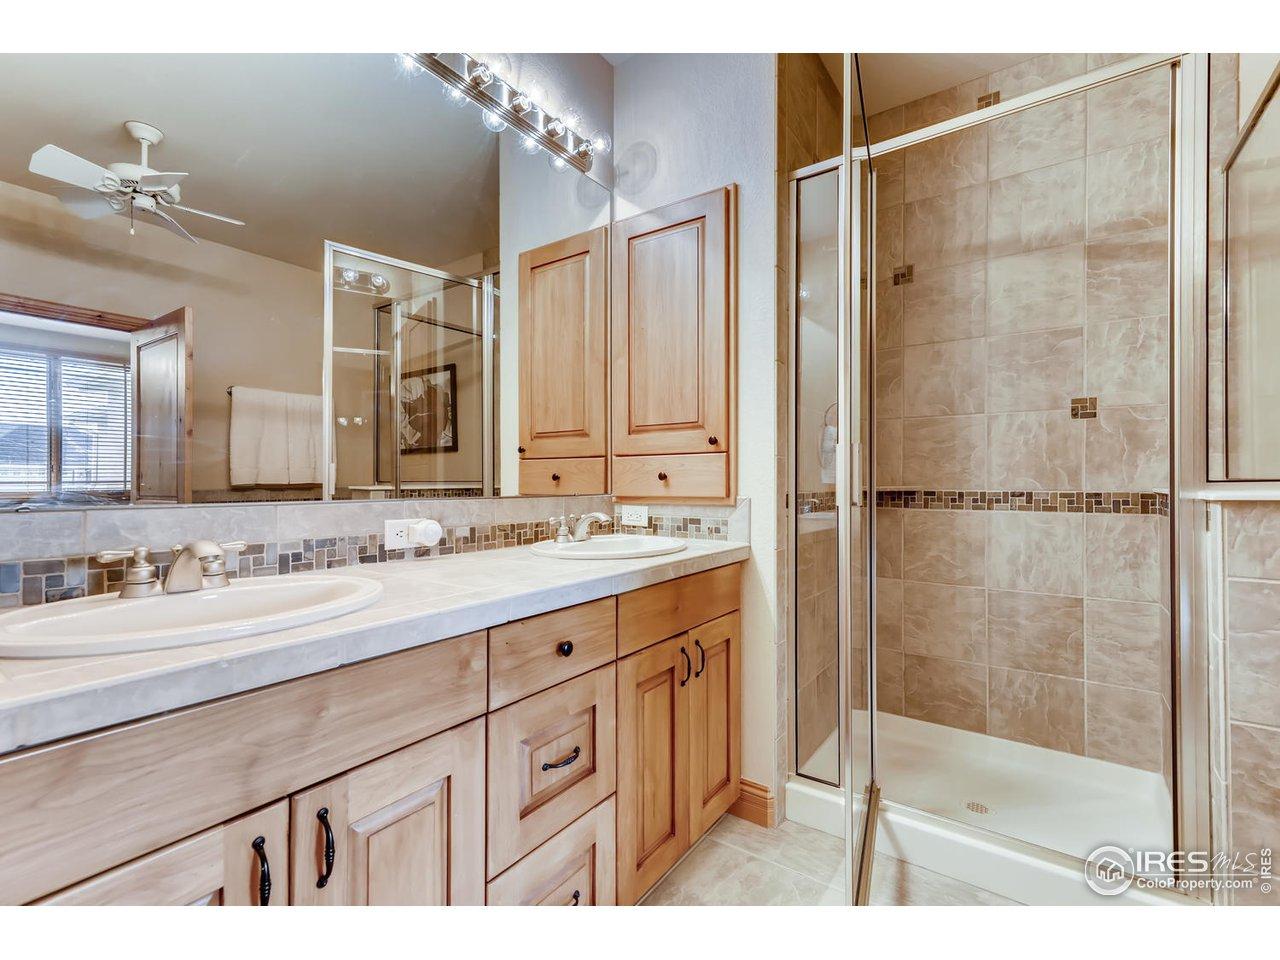 Master Bathroom - Shower & Soaking Tub